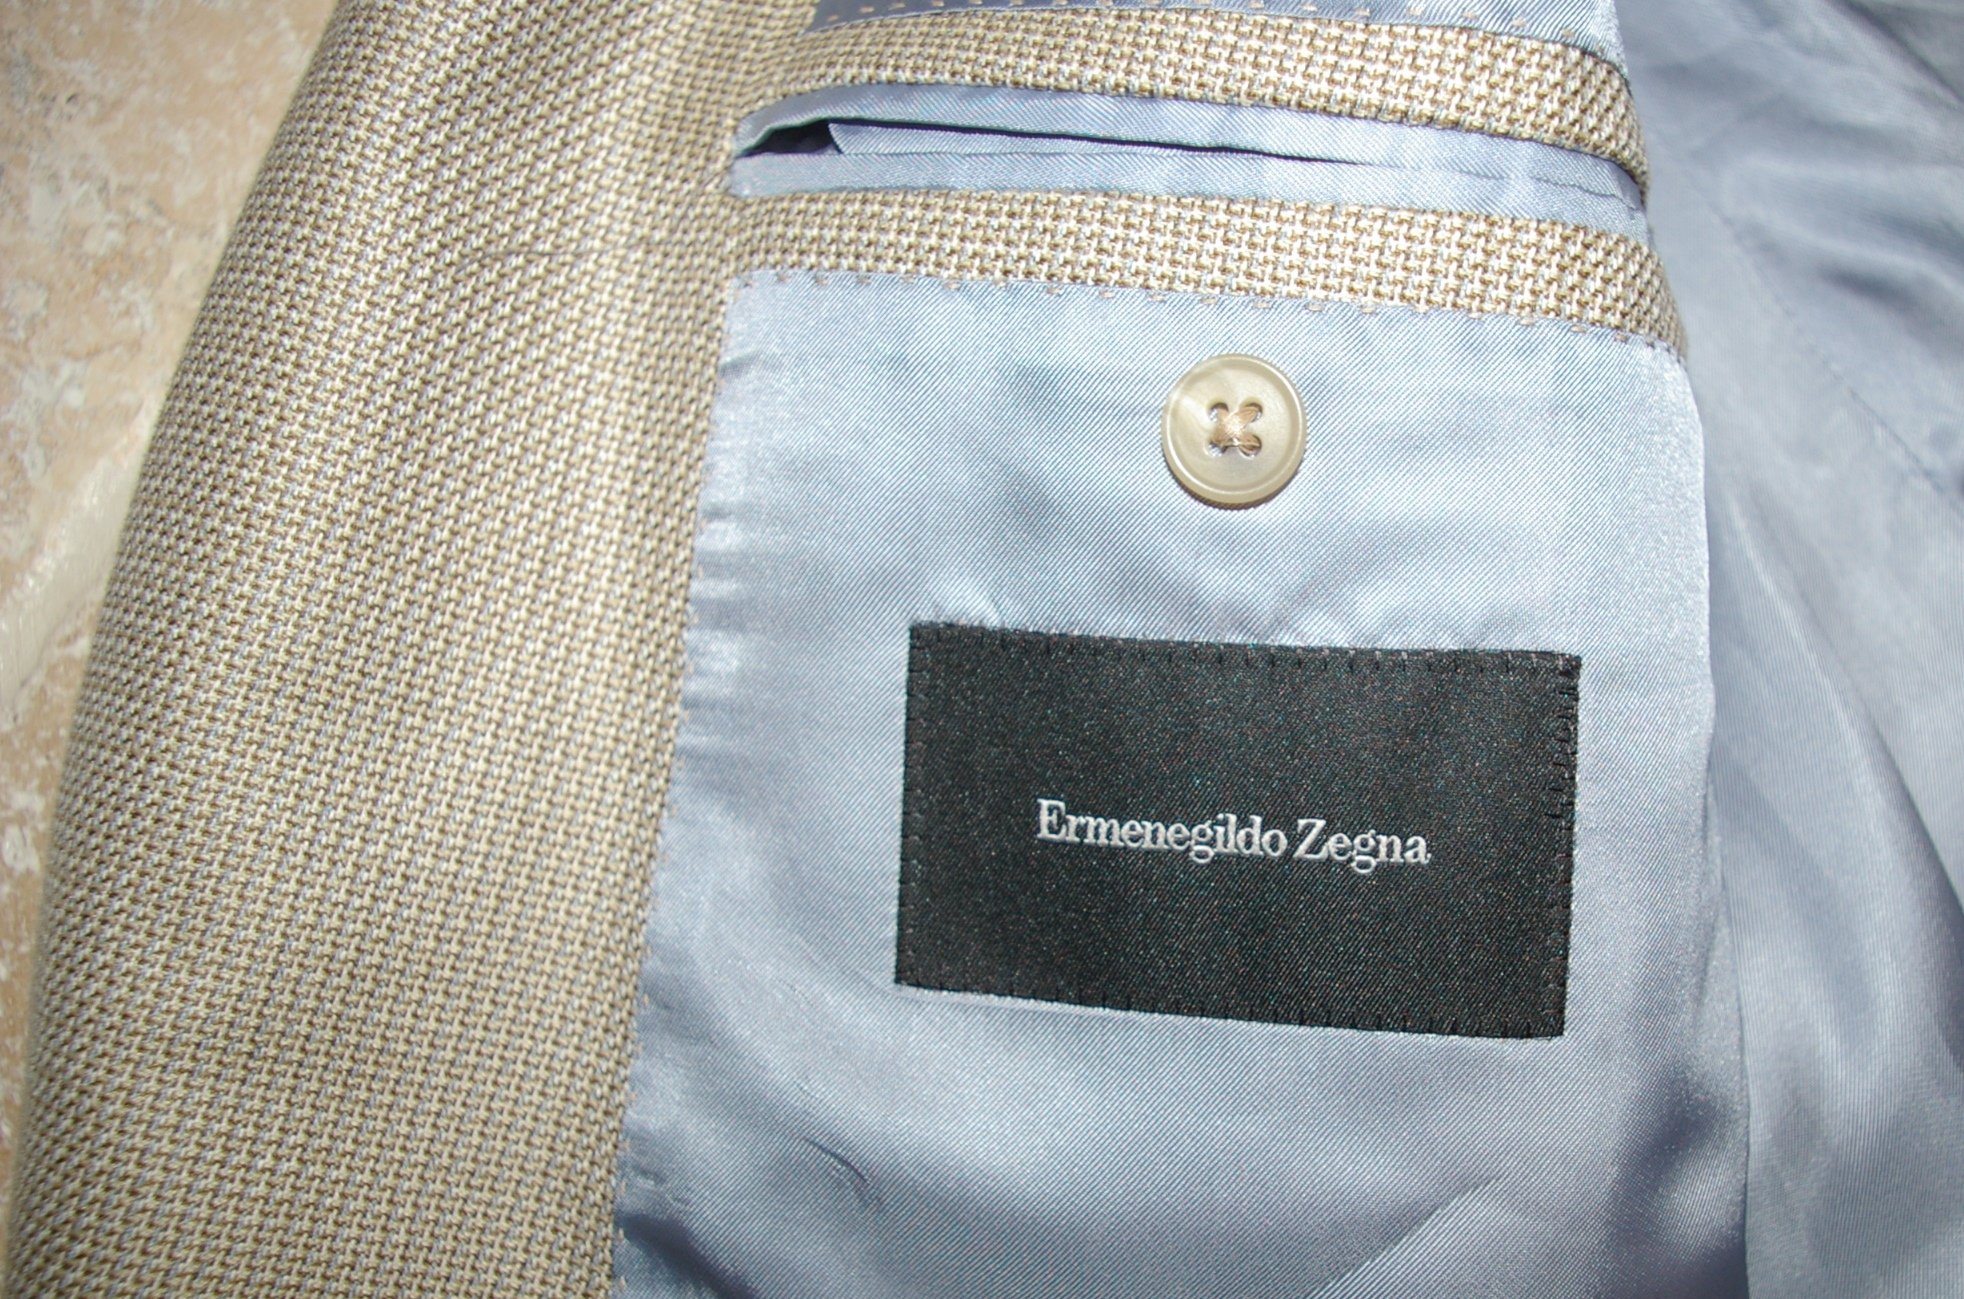 Zegna 002.JPG